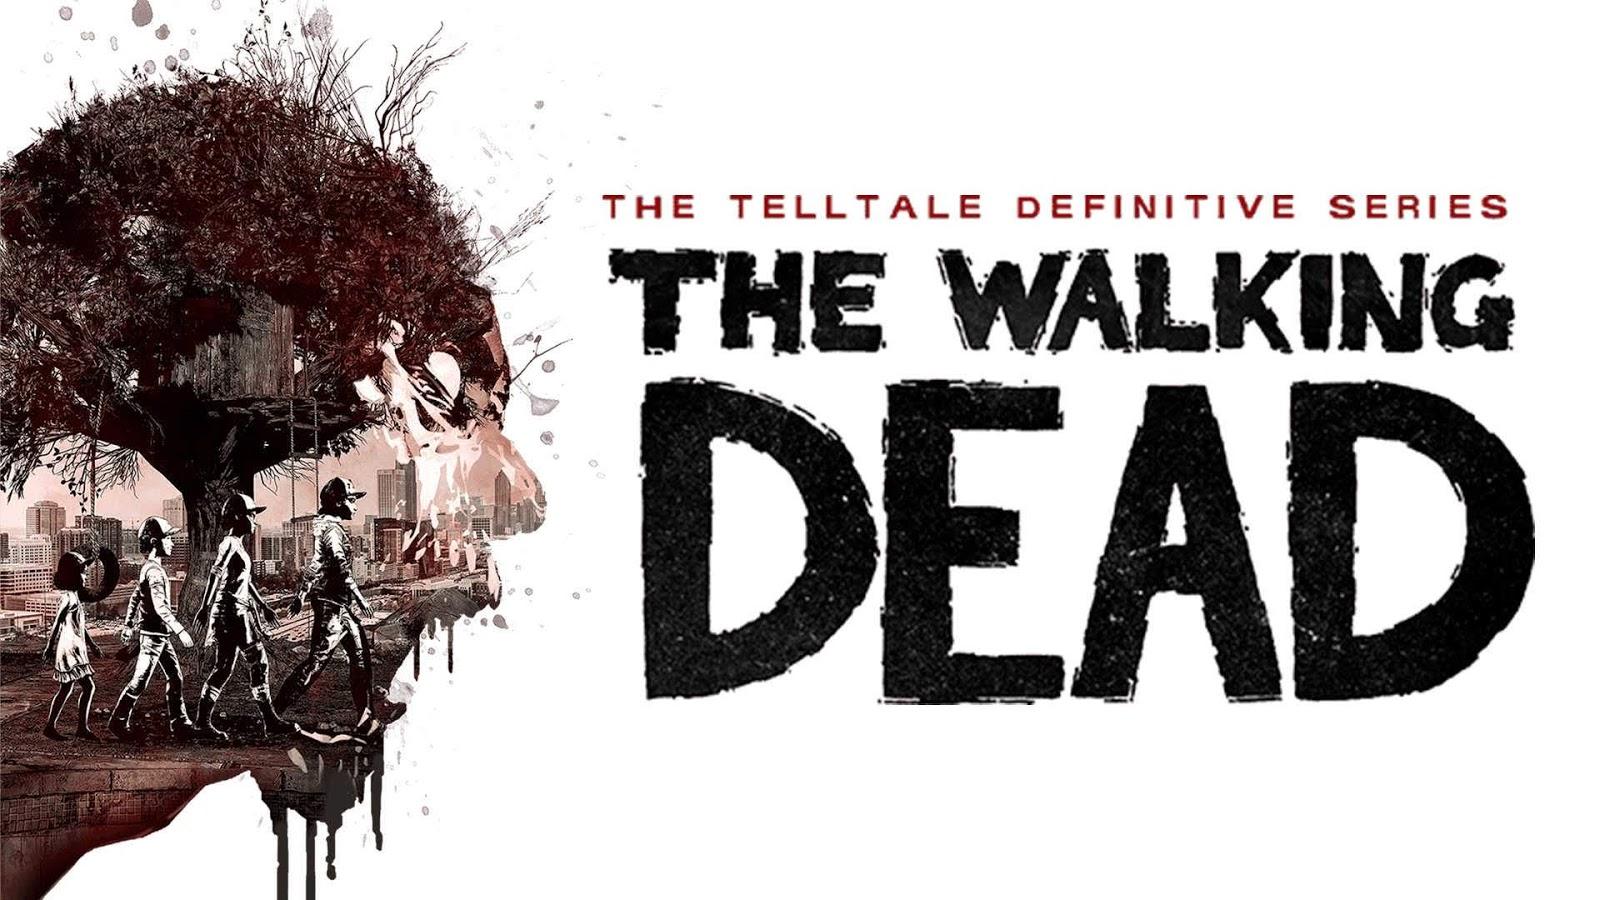 the-walking-dead-the-telltale-definitive-series